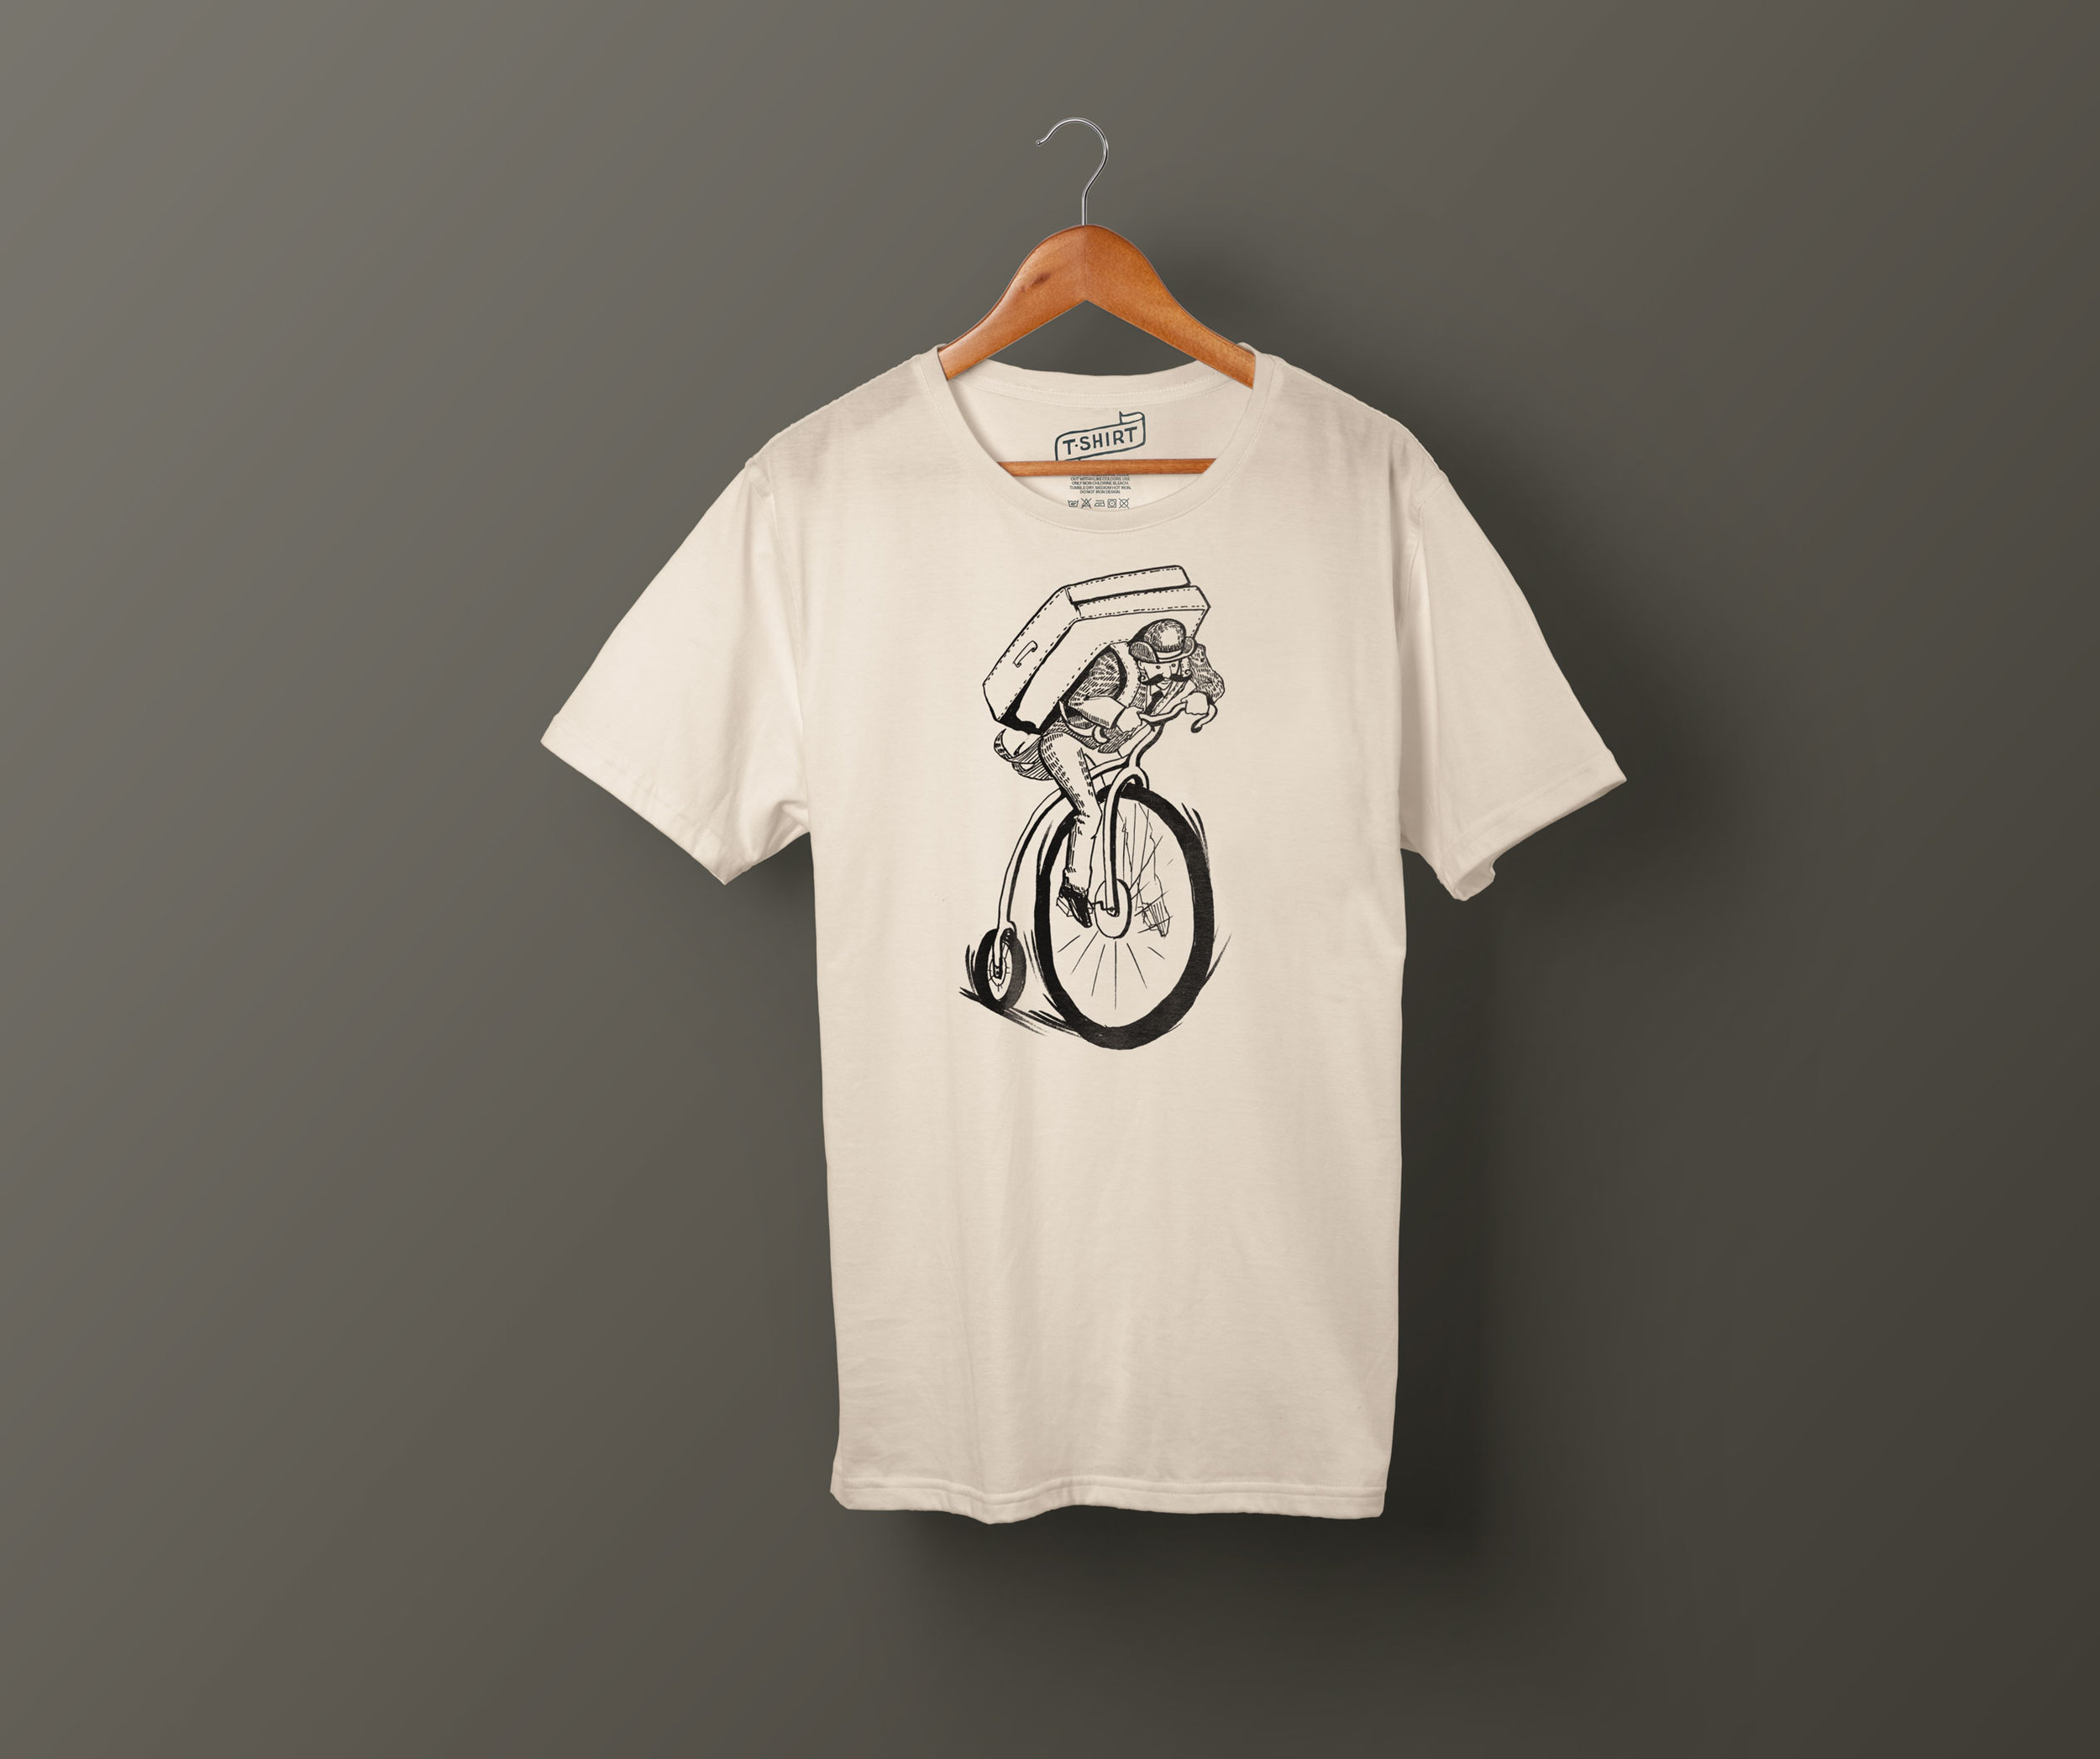 T-Shirt-Hanging-Mockup2.jpg